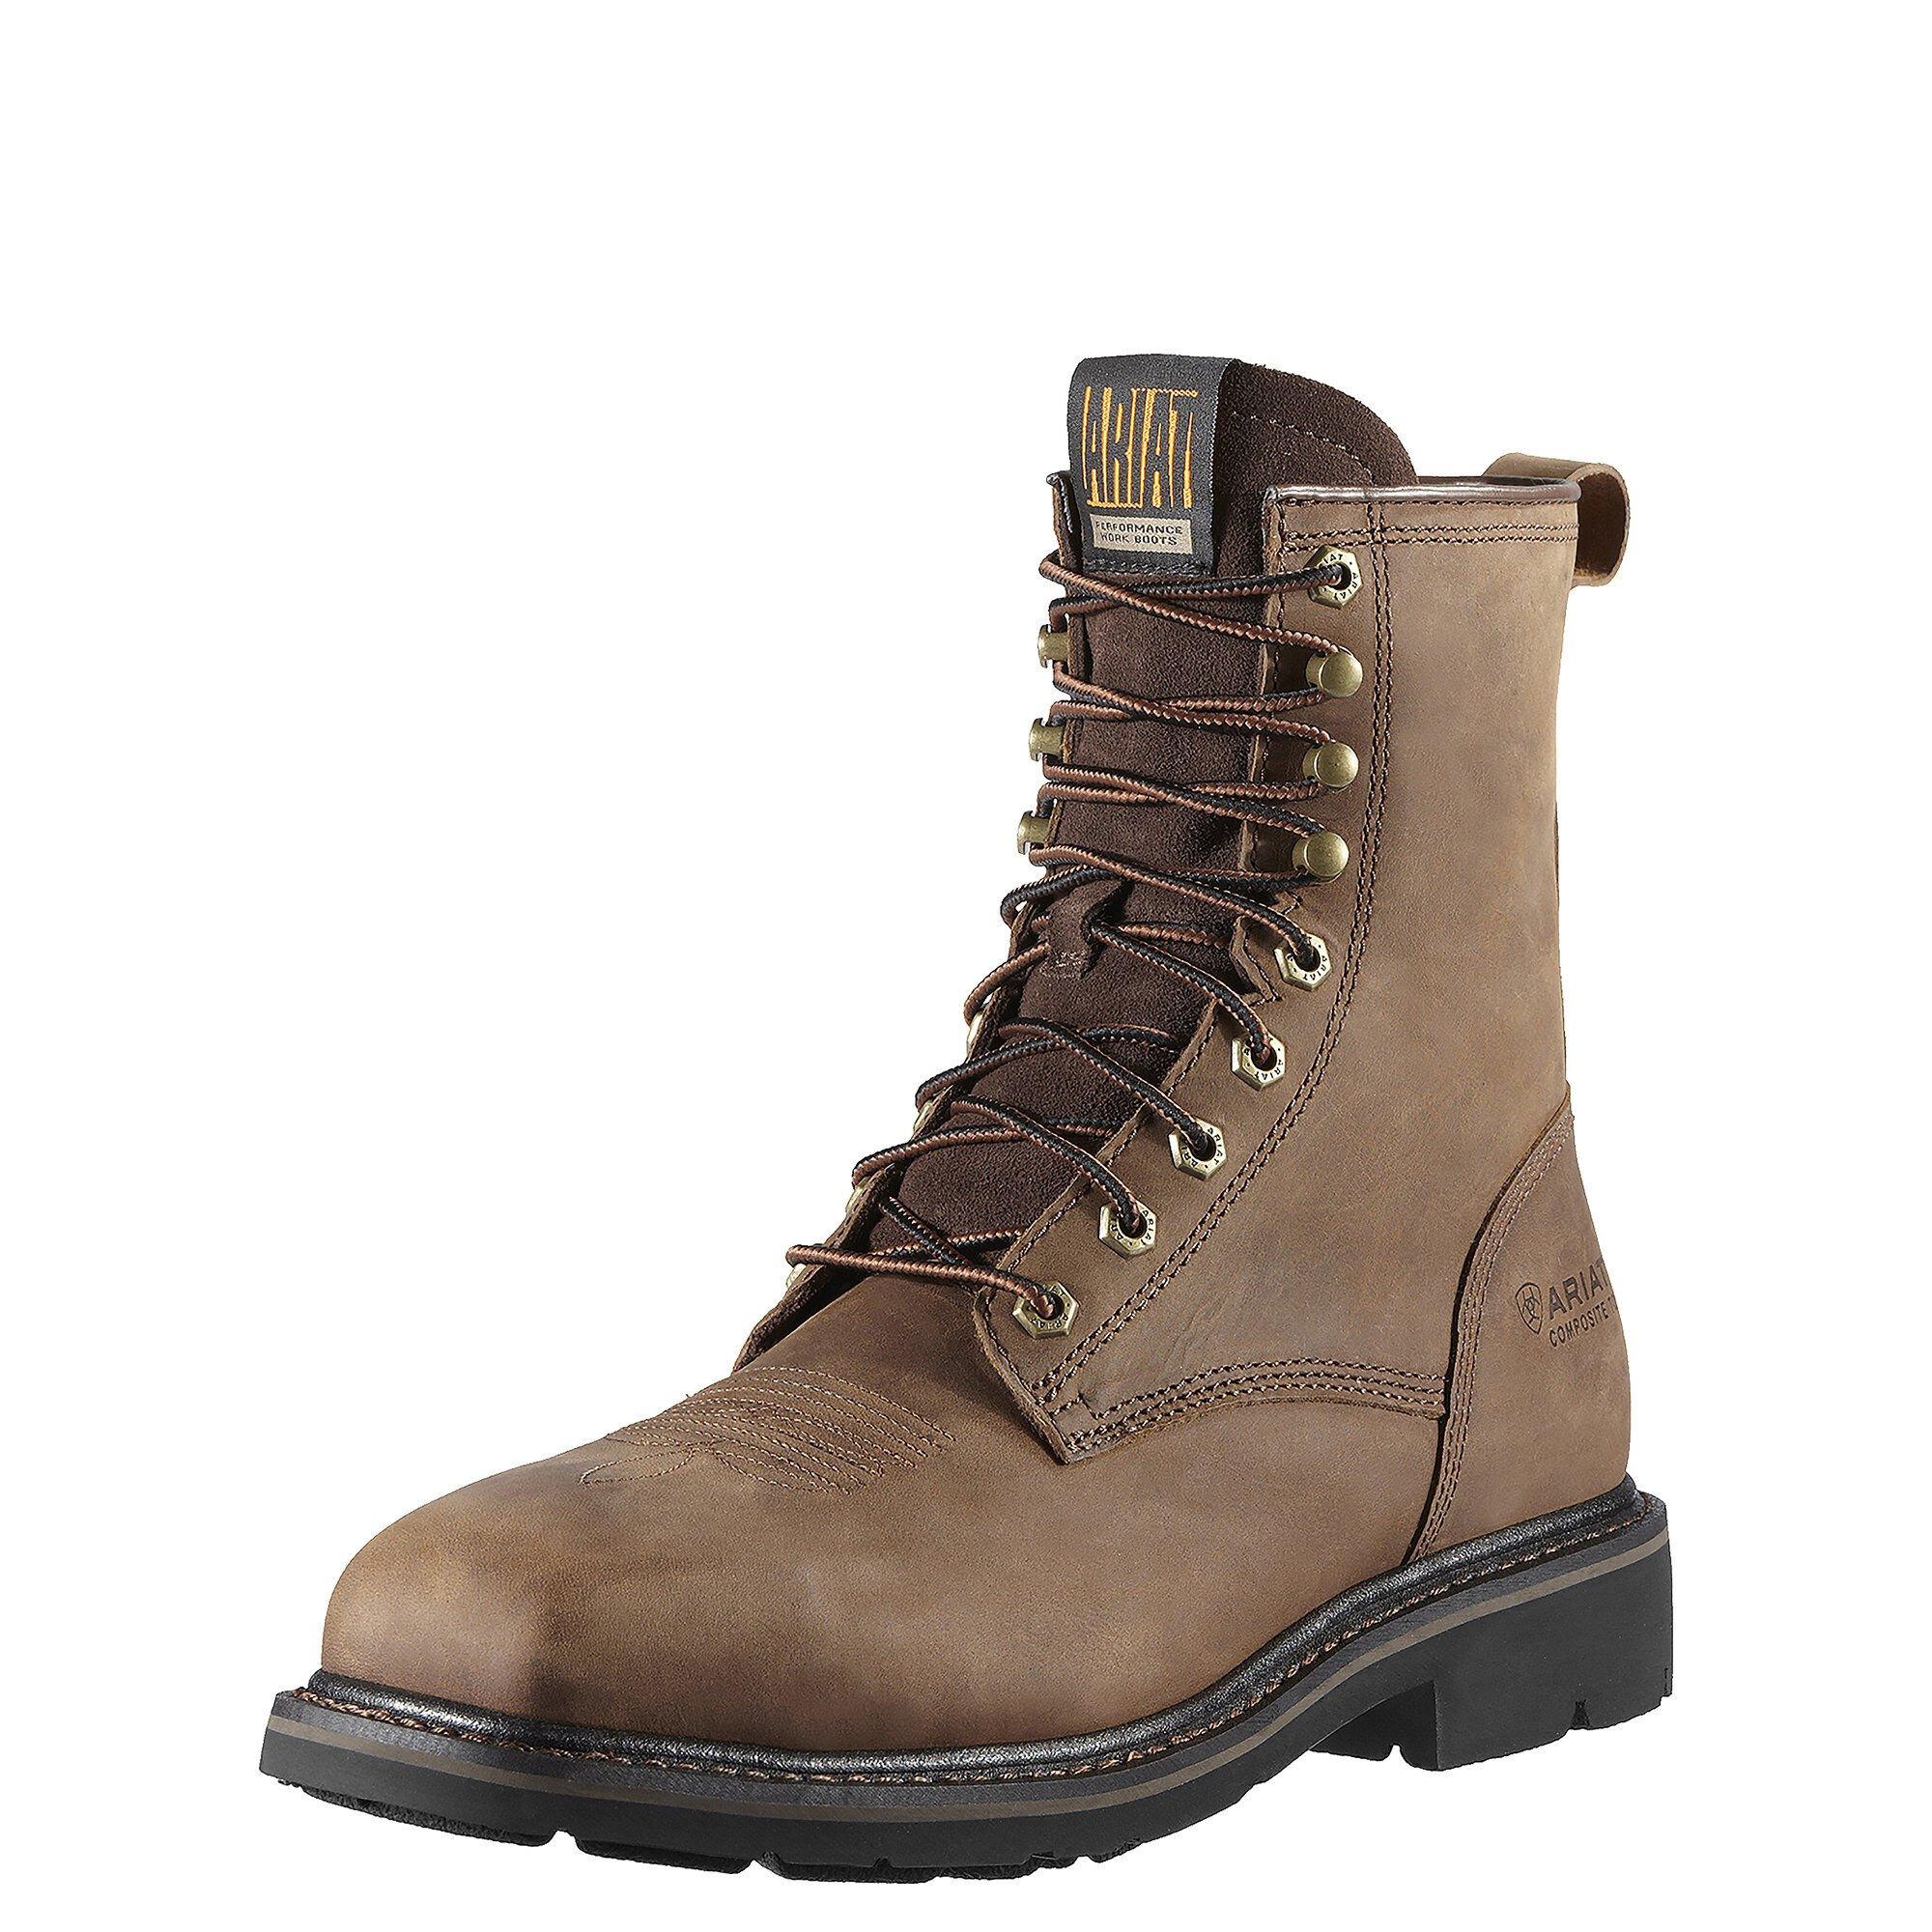 "Cascade 8"" Wide Square Toe Steel Toe Work Boot"